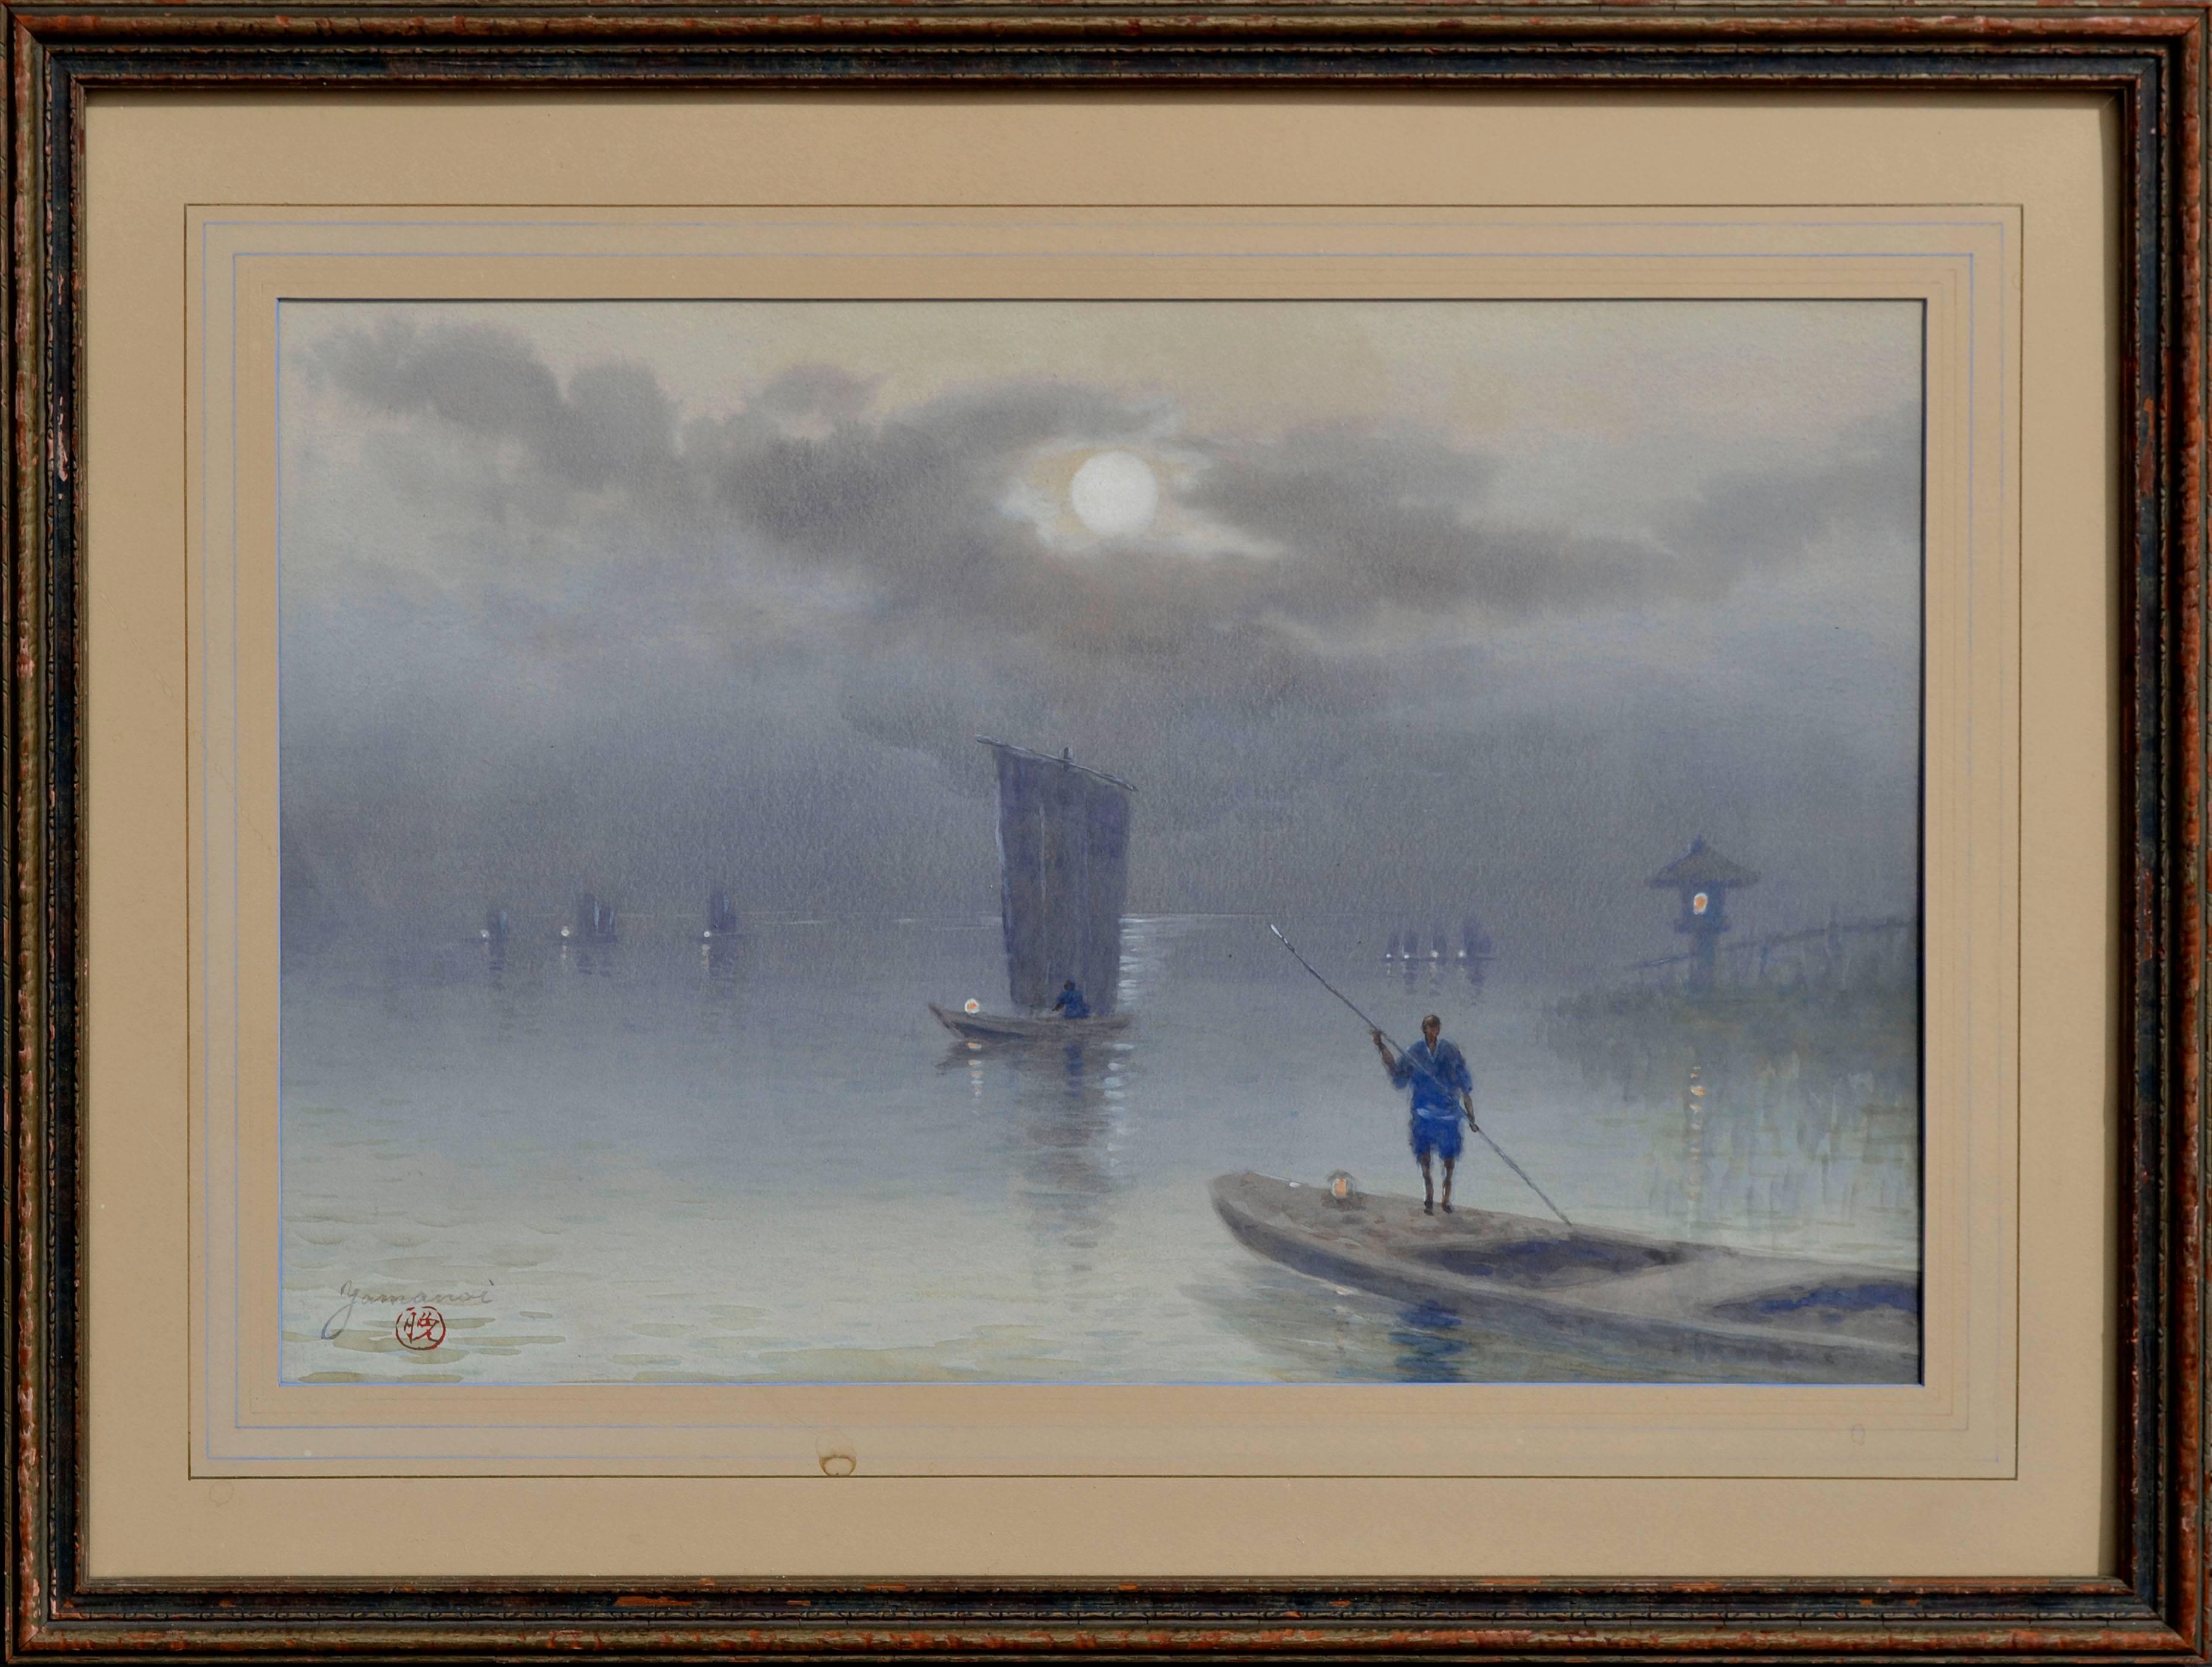 Fishing at Dawn - Figurative Landscape